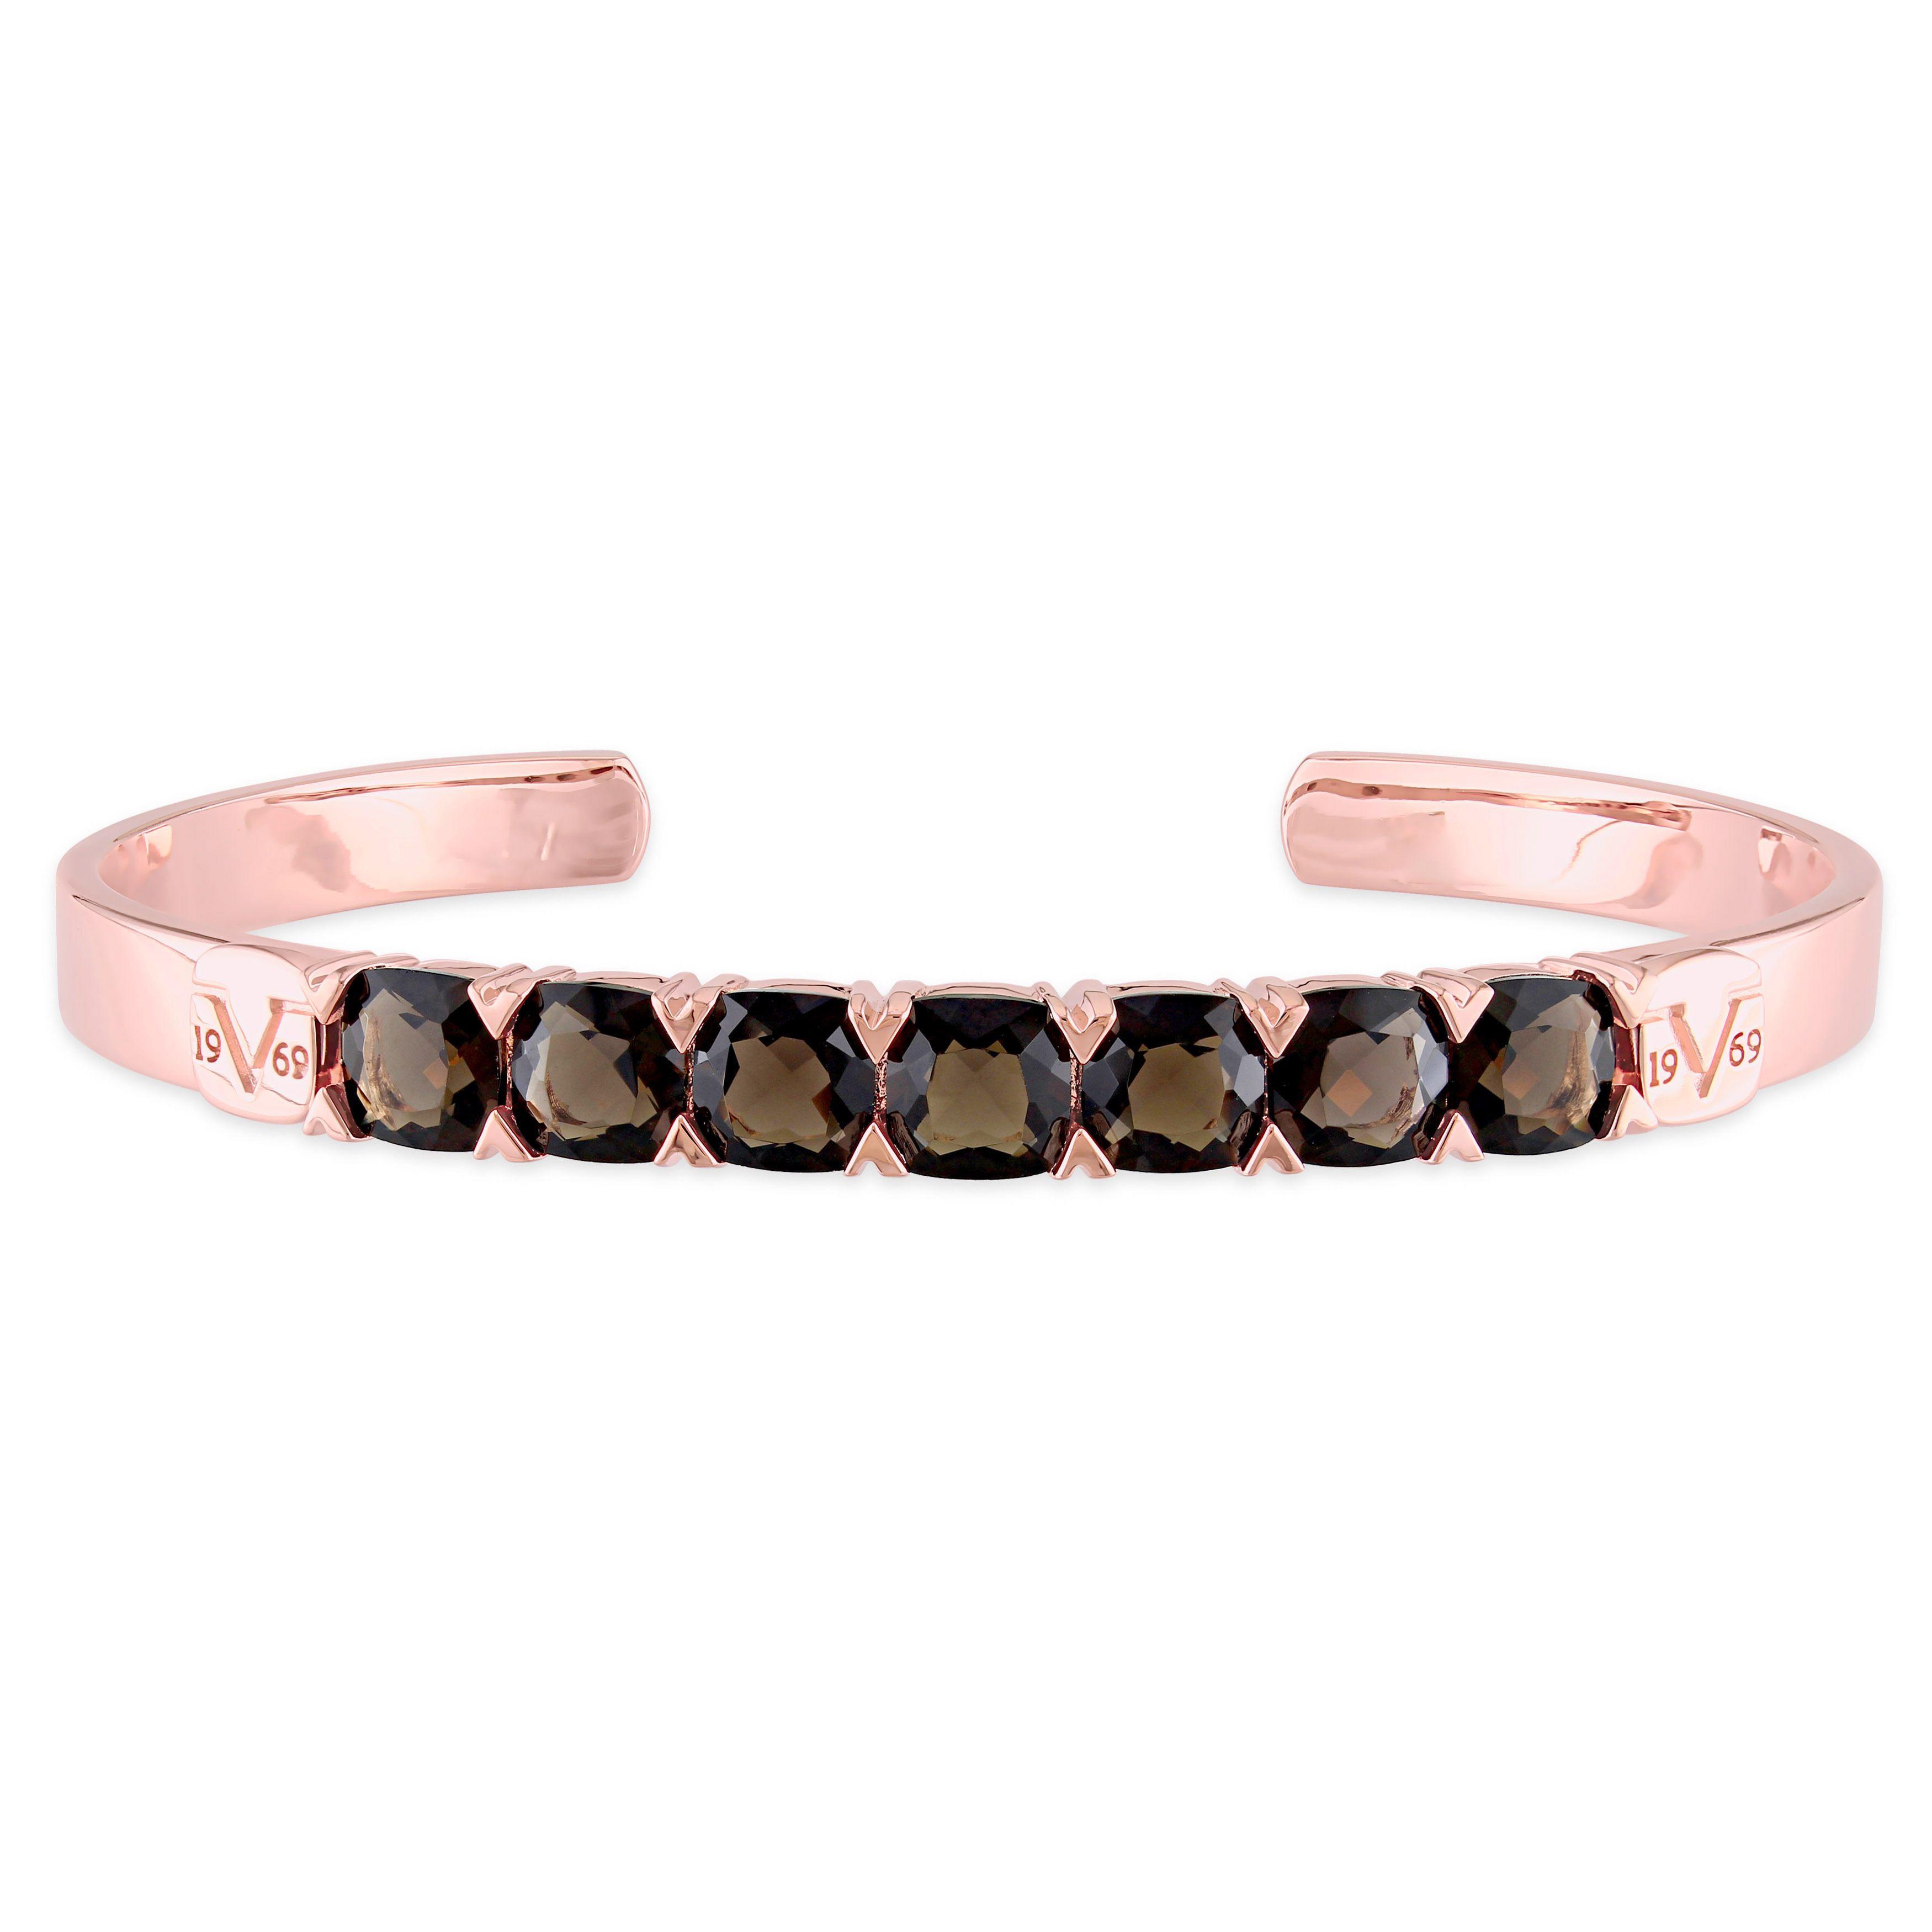 V italia smokey quartz bangle bracelet in k rose gold plated